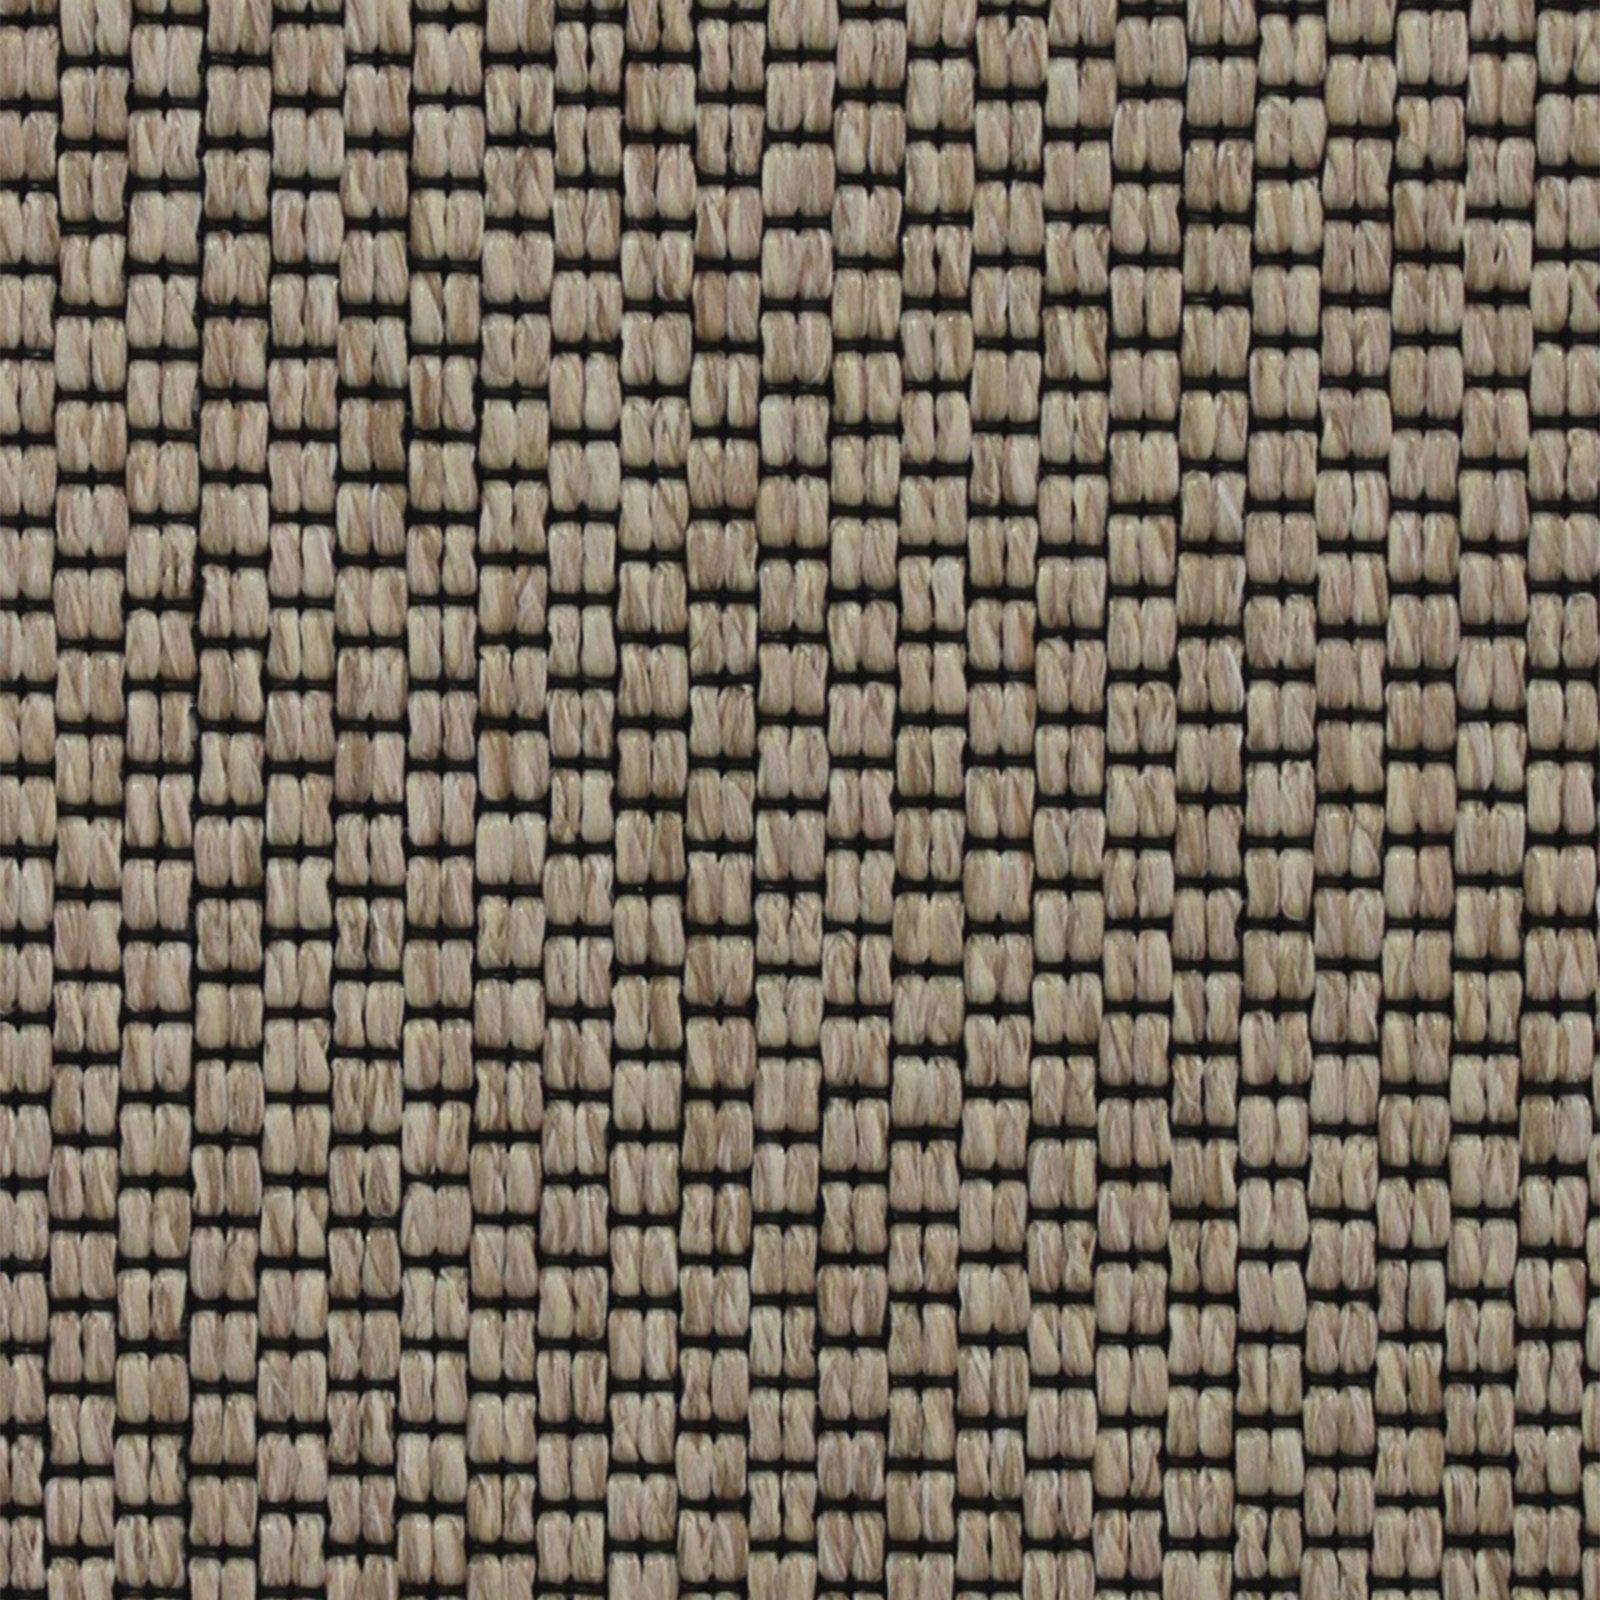 teppichboden norderney hellbeige 5 meter breit teppichboden bodenbel ge renovieren. Black Bedroom Furniture Sets. Home Design Ideas